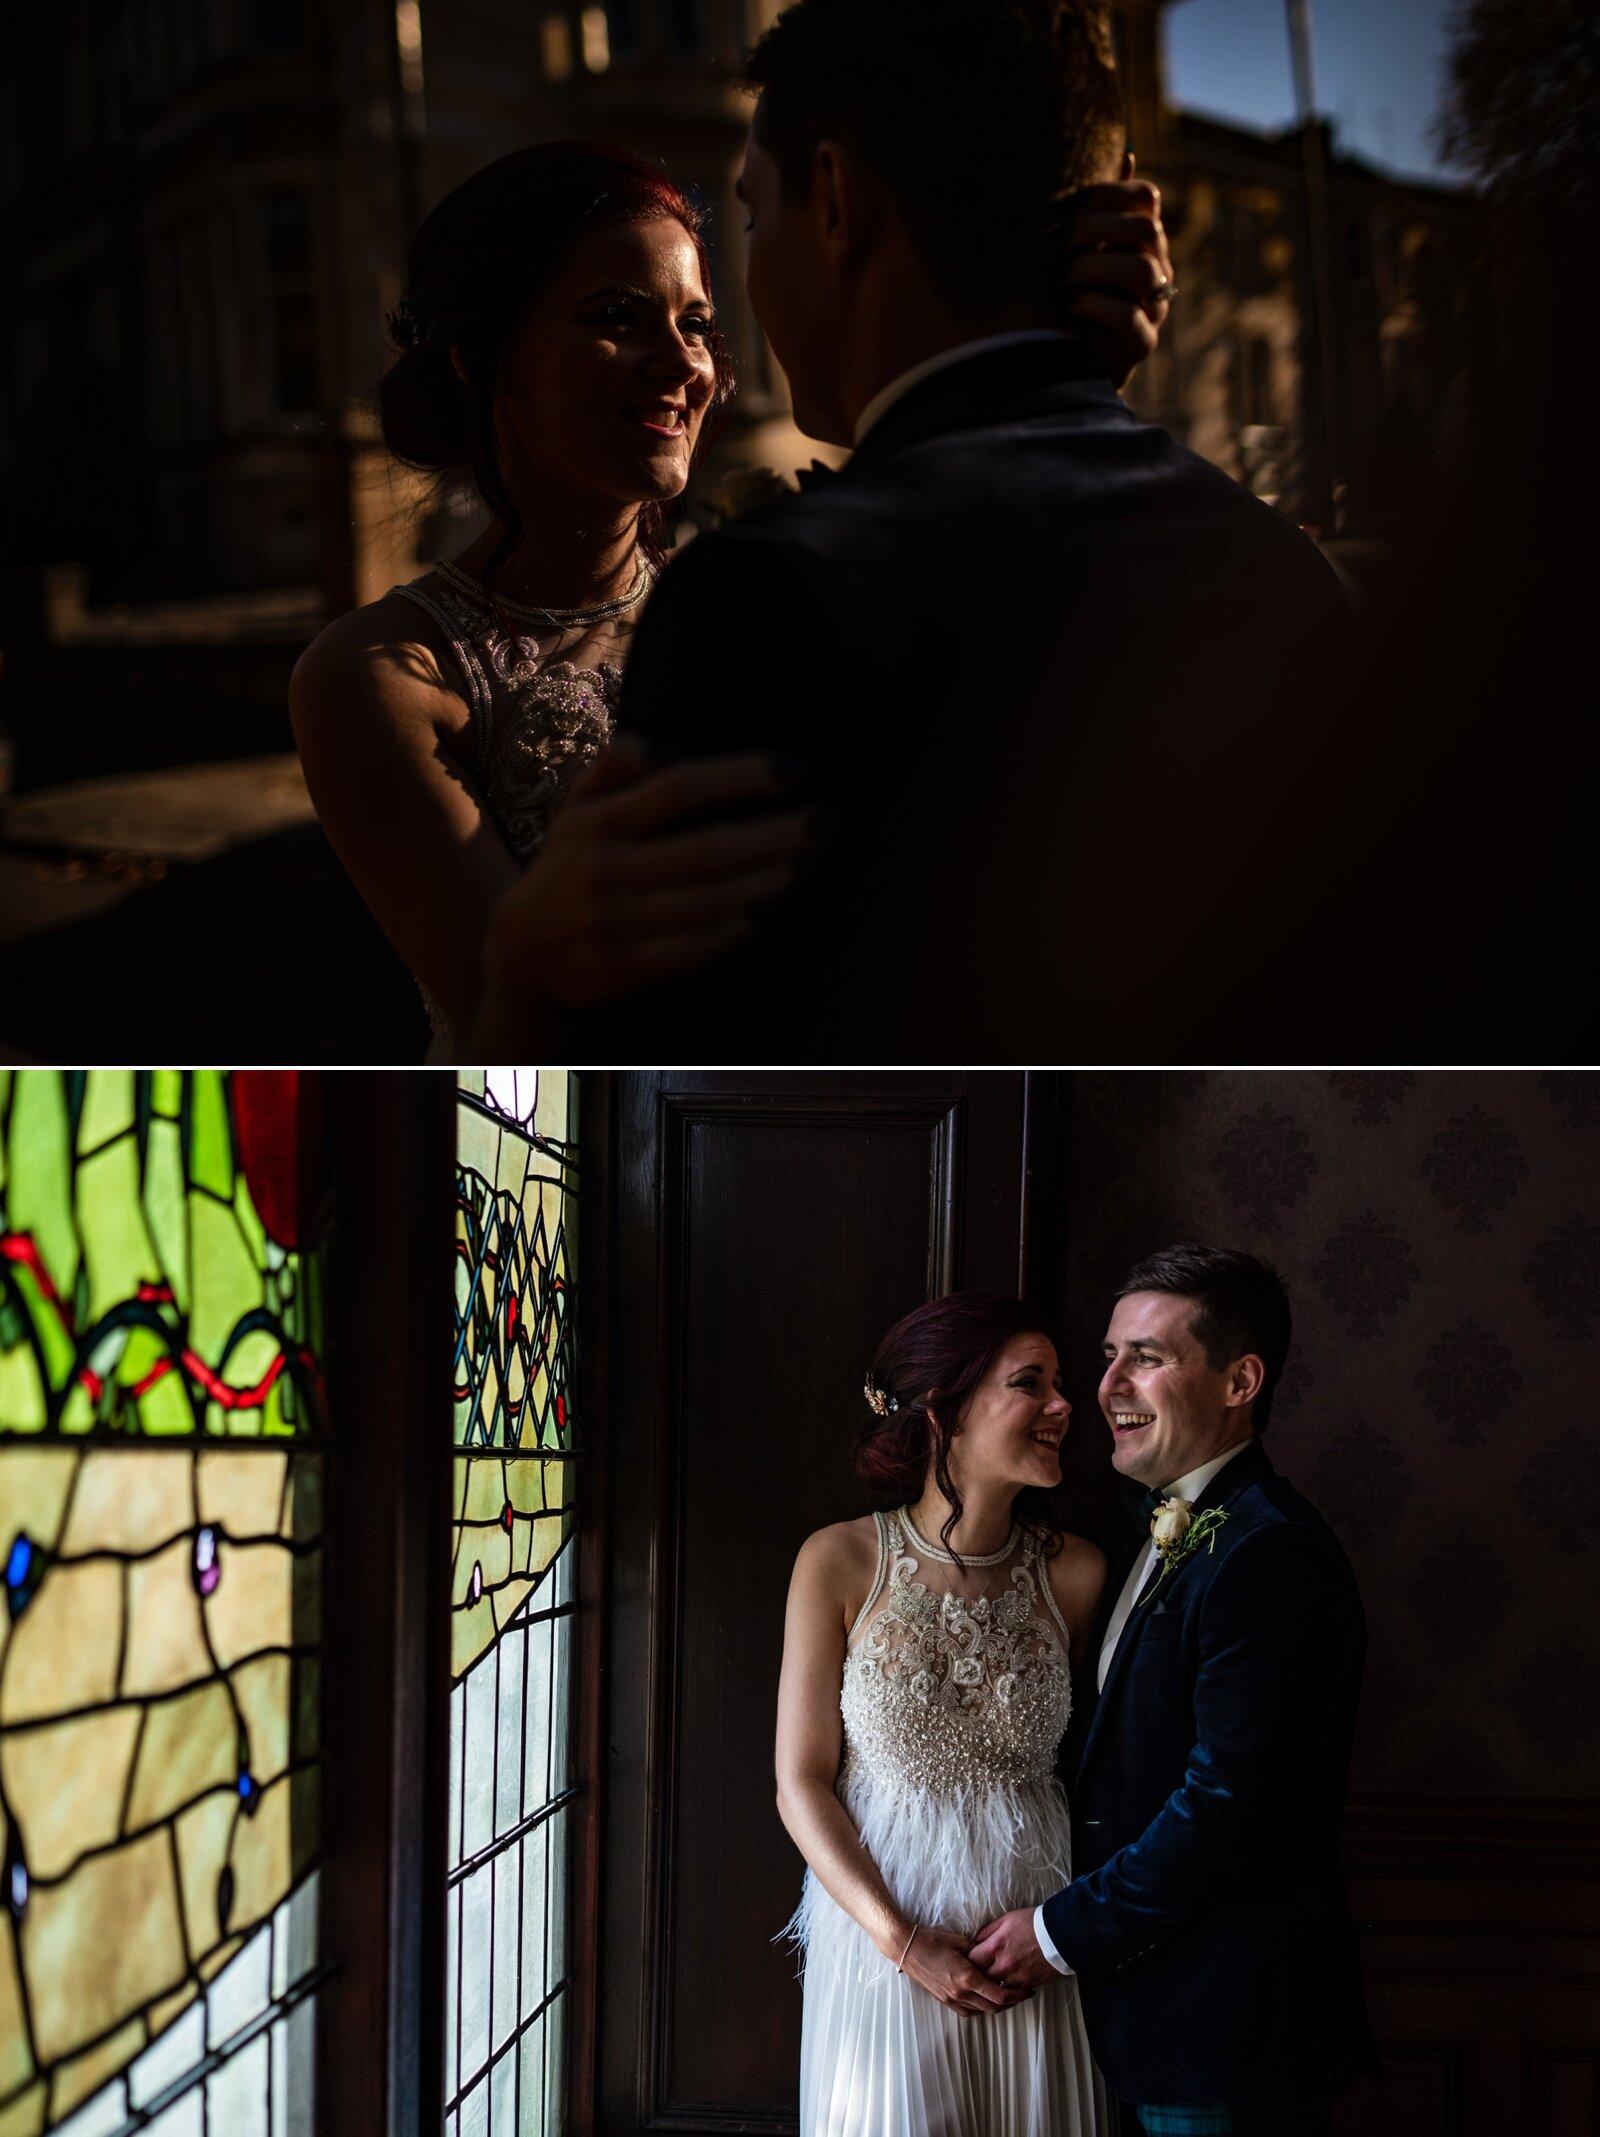 Andy&Szerdi-Photography_Couple_Elaine-Stephen-17.jpg